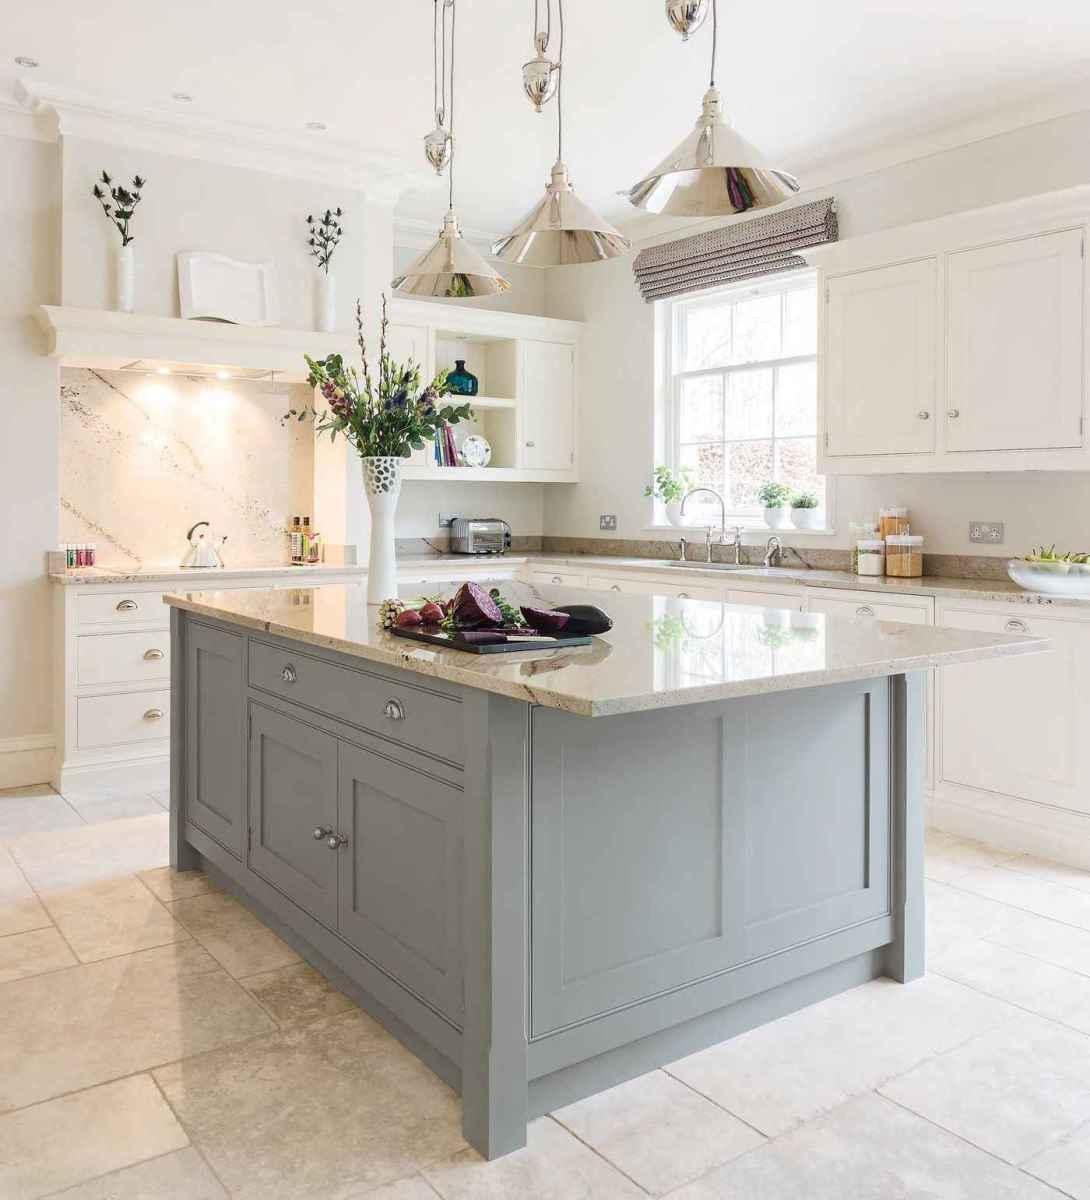 Gorgeous modern kitchen ideas and design (5)